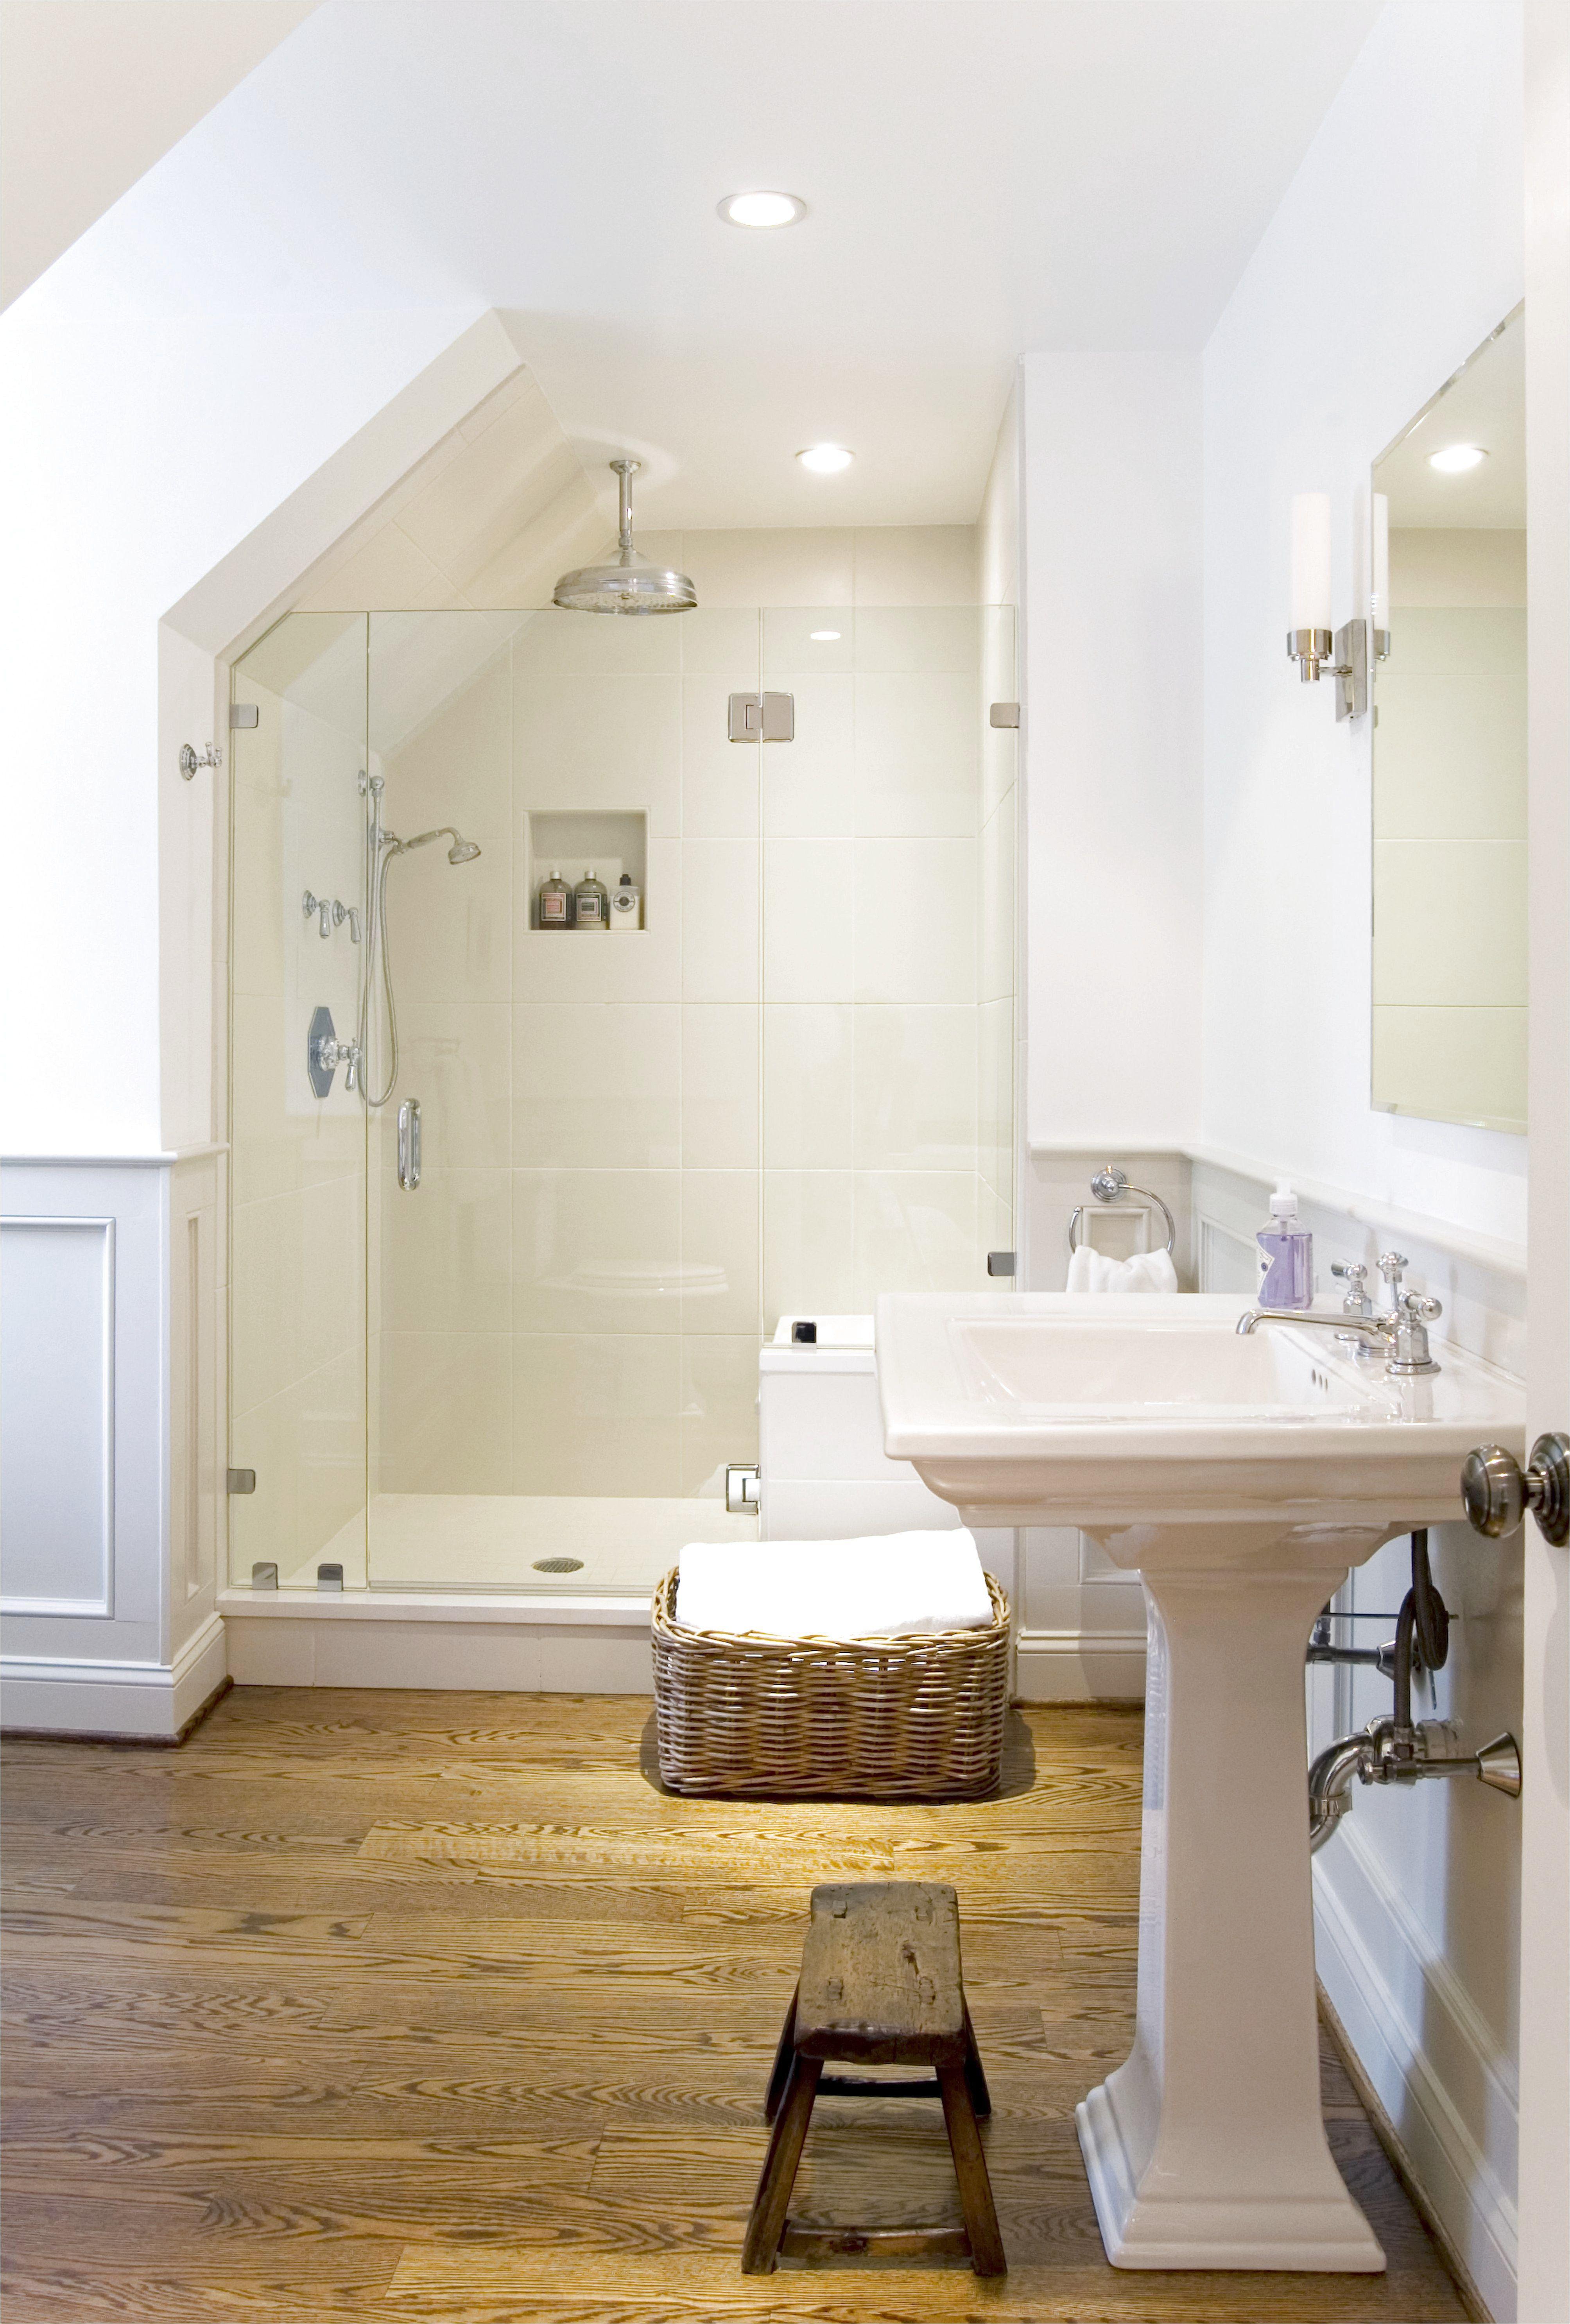 Gorgeous Third Floor Attic Suite Reno Ceramicfloordesigns Click The Image Or Link For More Info In 2020 Loft Bathroom Bathroom Design Small Bathroom Remodel